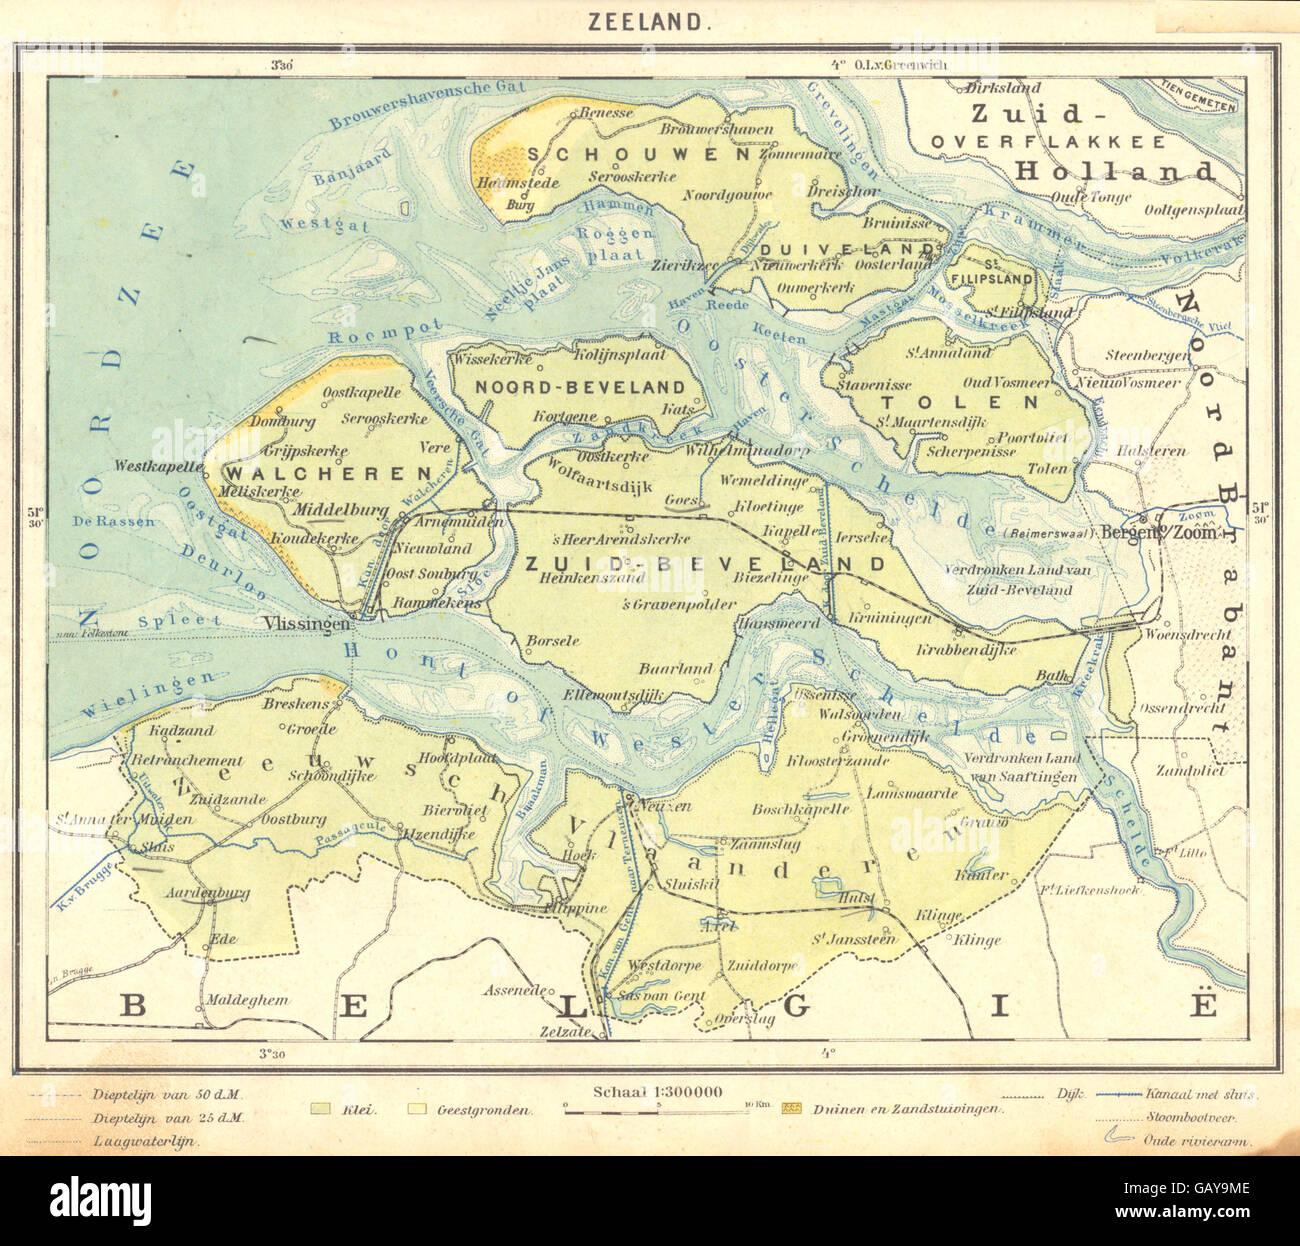 NETHERLANDS: Zeeland, 1922 vintage map Stock Photo ... on map of drayton, map of flevoland, map of vassar, map of ray, map of dorr, map of drenthe, map of minnewaukan, map of dordrecht, map of randstad, map of holland, map of turtle lake, map of saranac, map of brabant, map of leonard, map of leeuwarden, map of arthur, map of schoolcraft, map of domburg, map of ostergotland, map of big rapids,